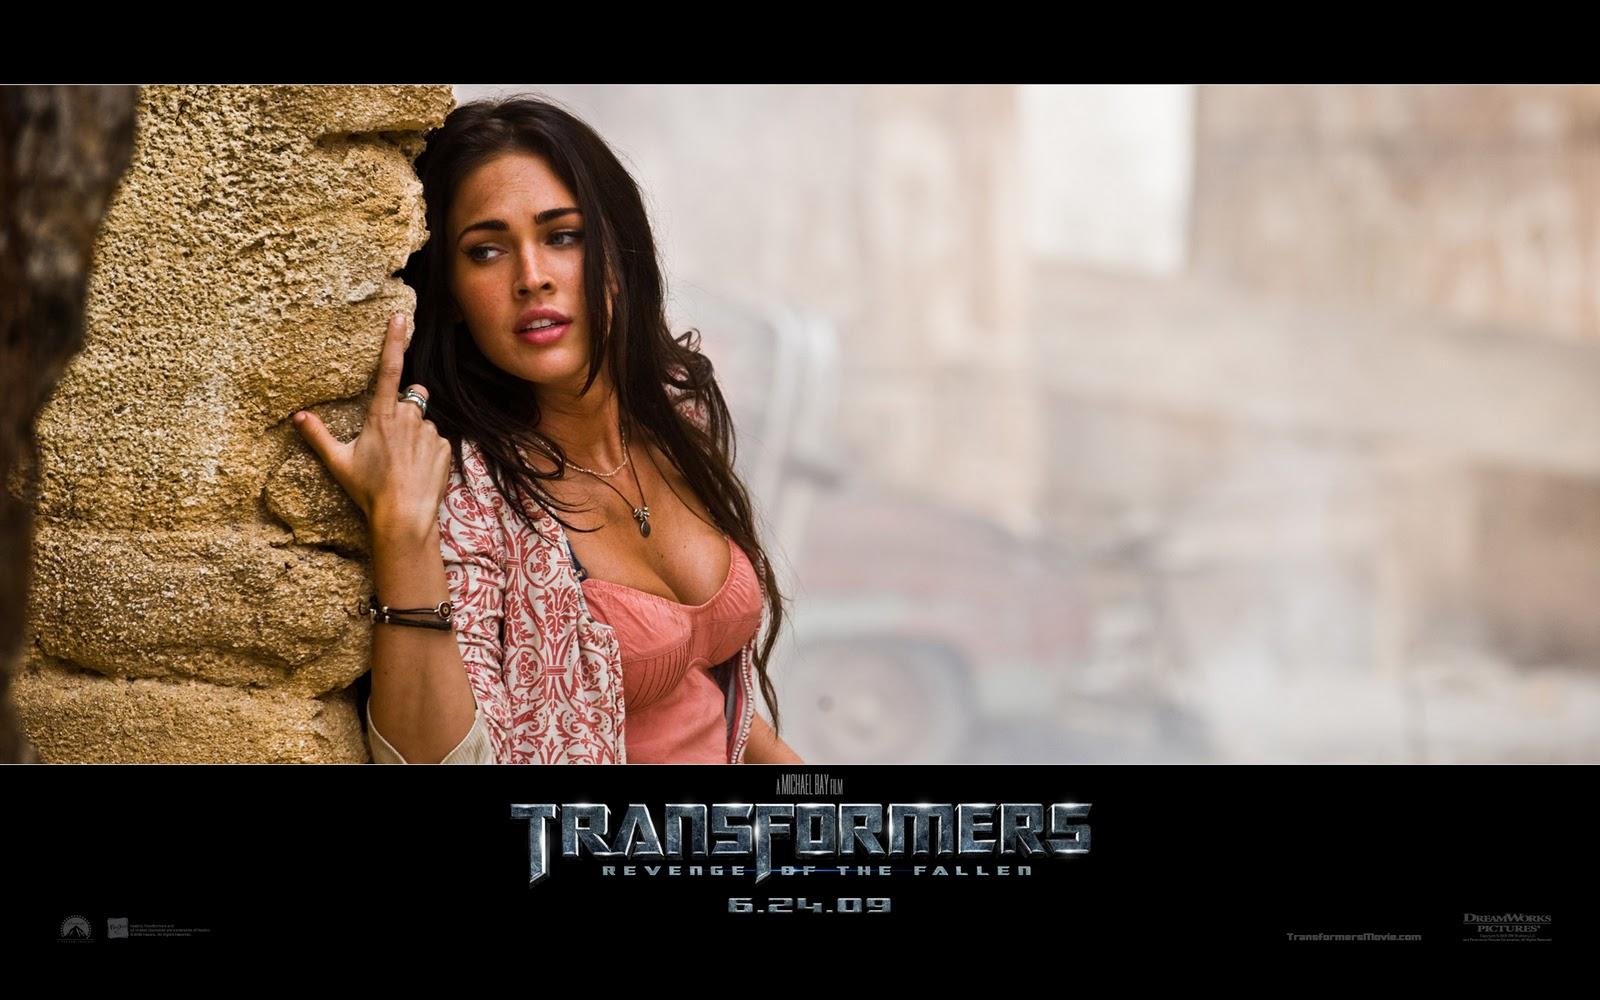 http://2.bp.blogspot.com/-66DNeSj40II/TrelEX2GsGI/AAAAAAAAAKA/WaLasDG9uNA/s1600/sexy-megan-fox-transformers-2-pics.jpg